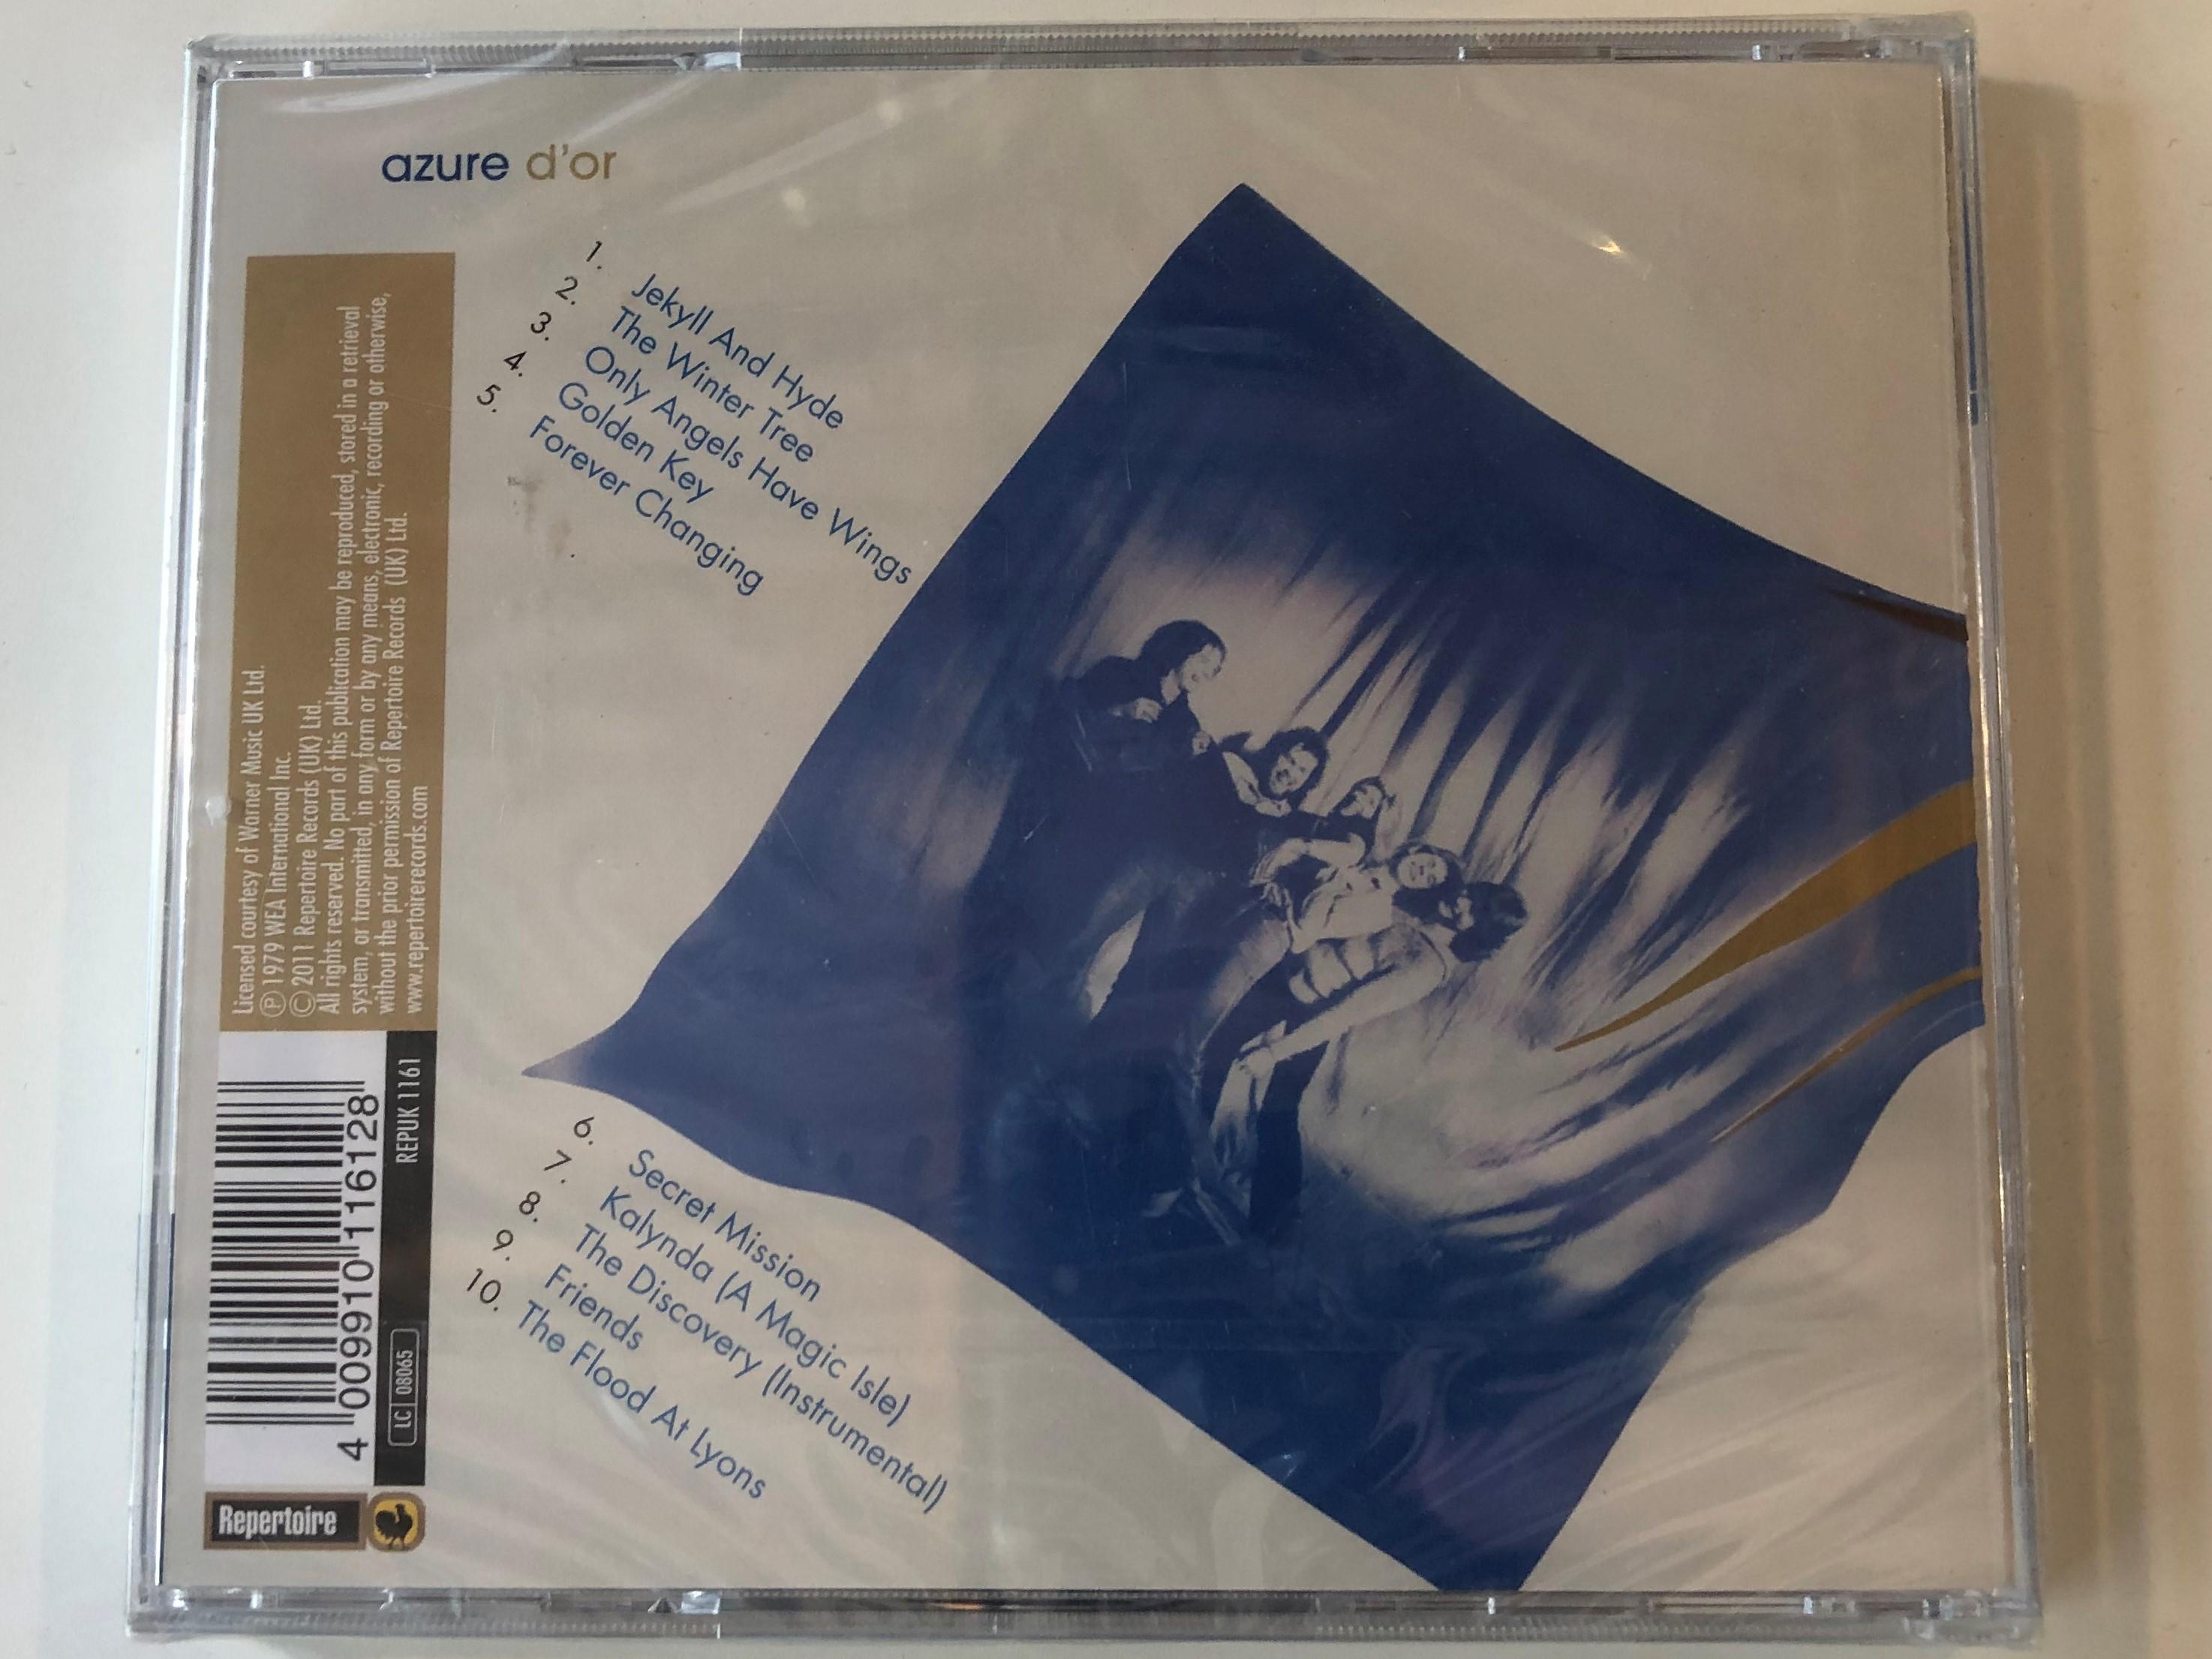 renaissance-azure-d-or-repertoire-records-audio-cd-2011-repuk-1161-2-.jpg